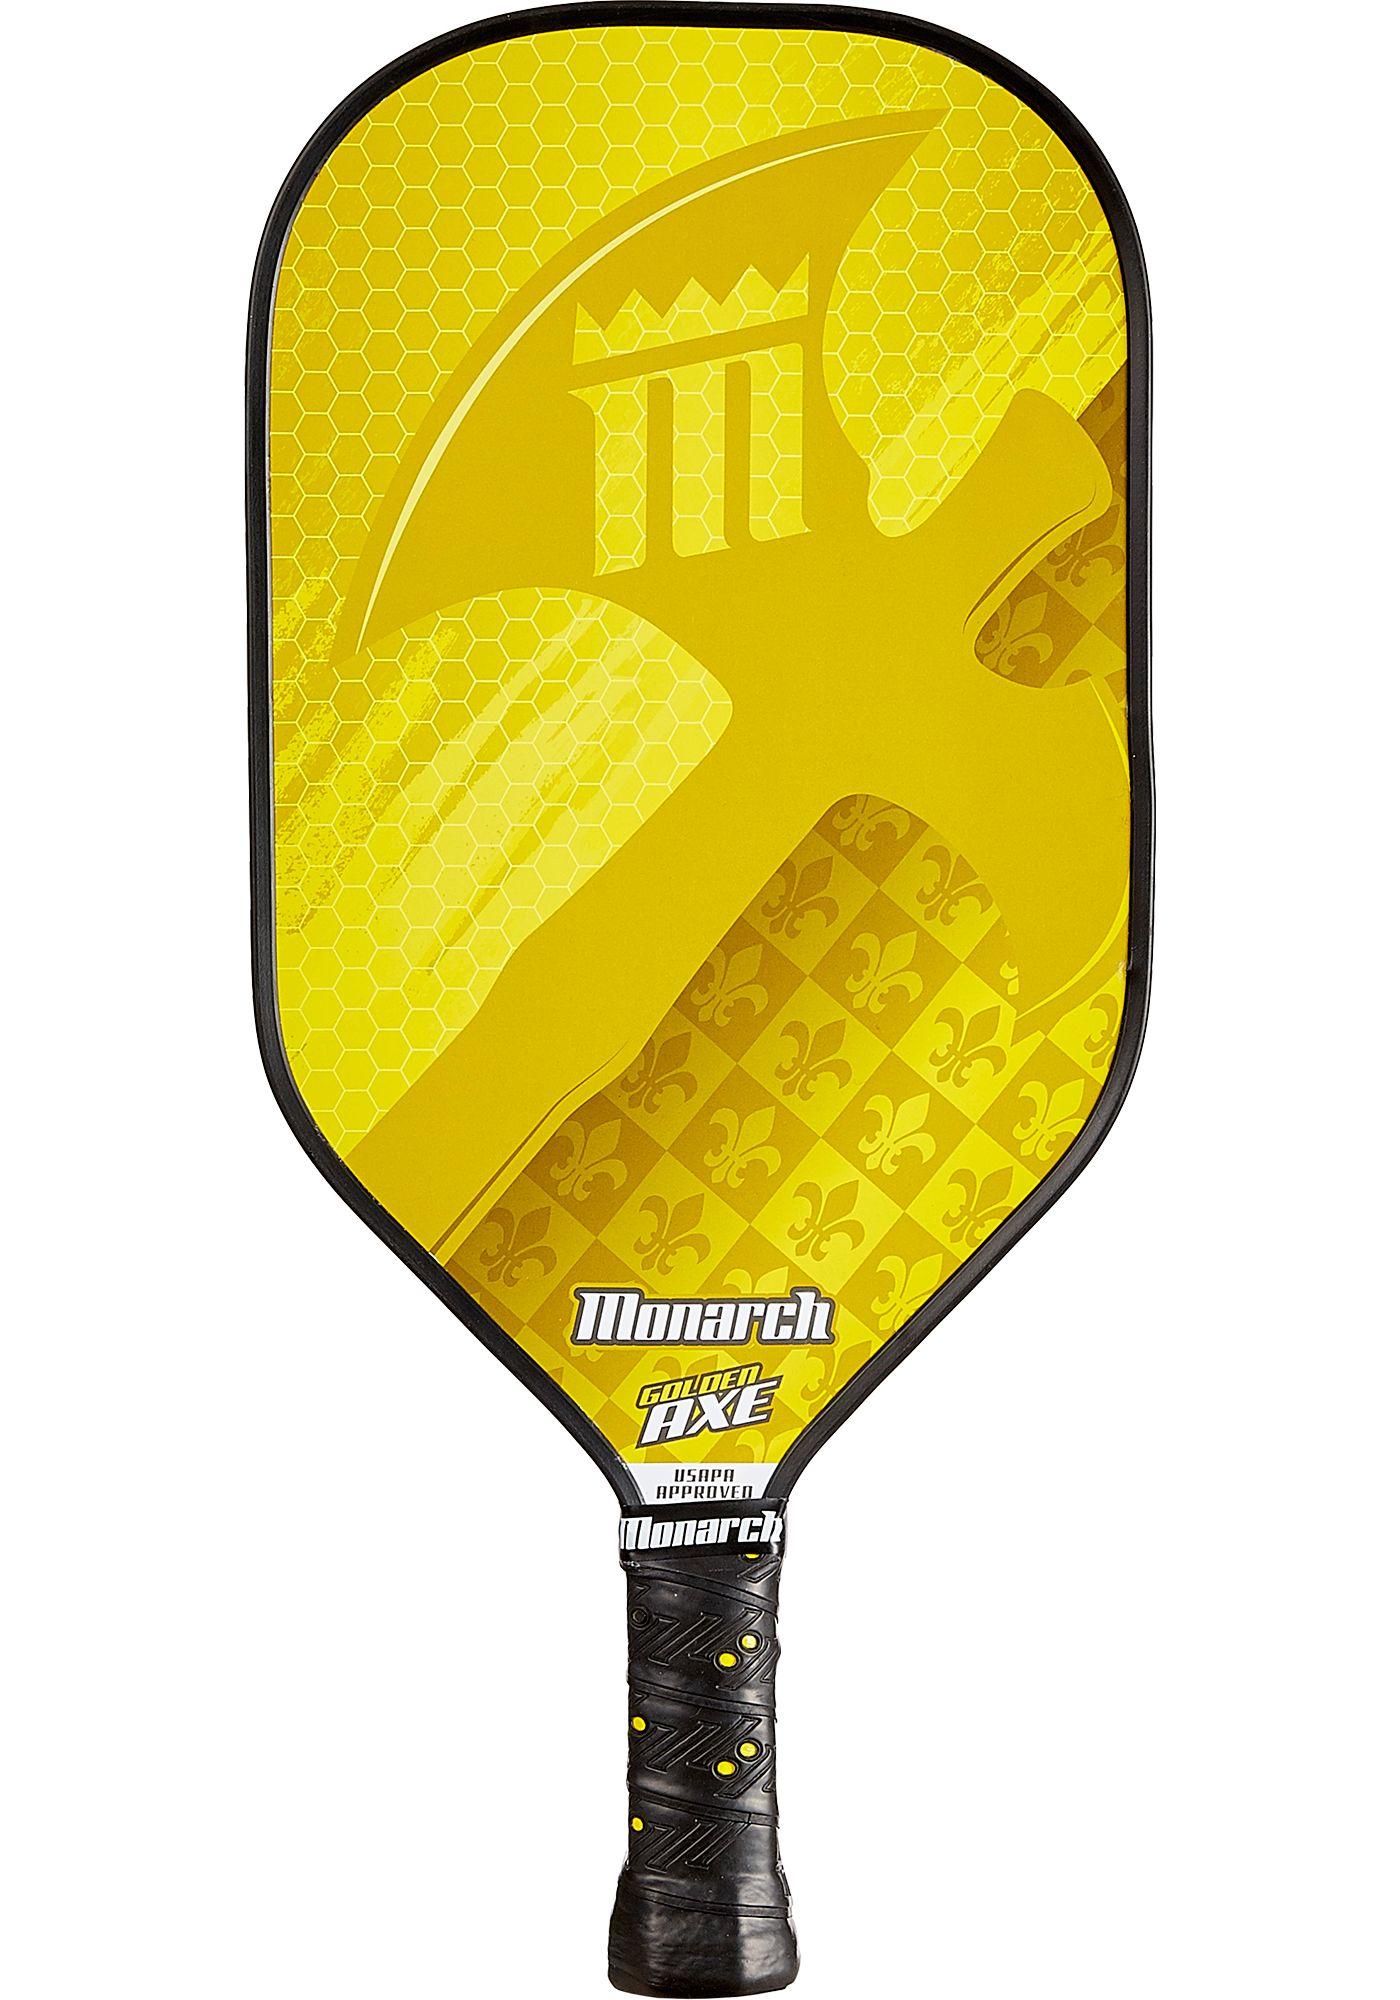 Monarch Golden Axe Pickleball Paddle